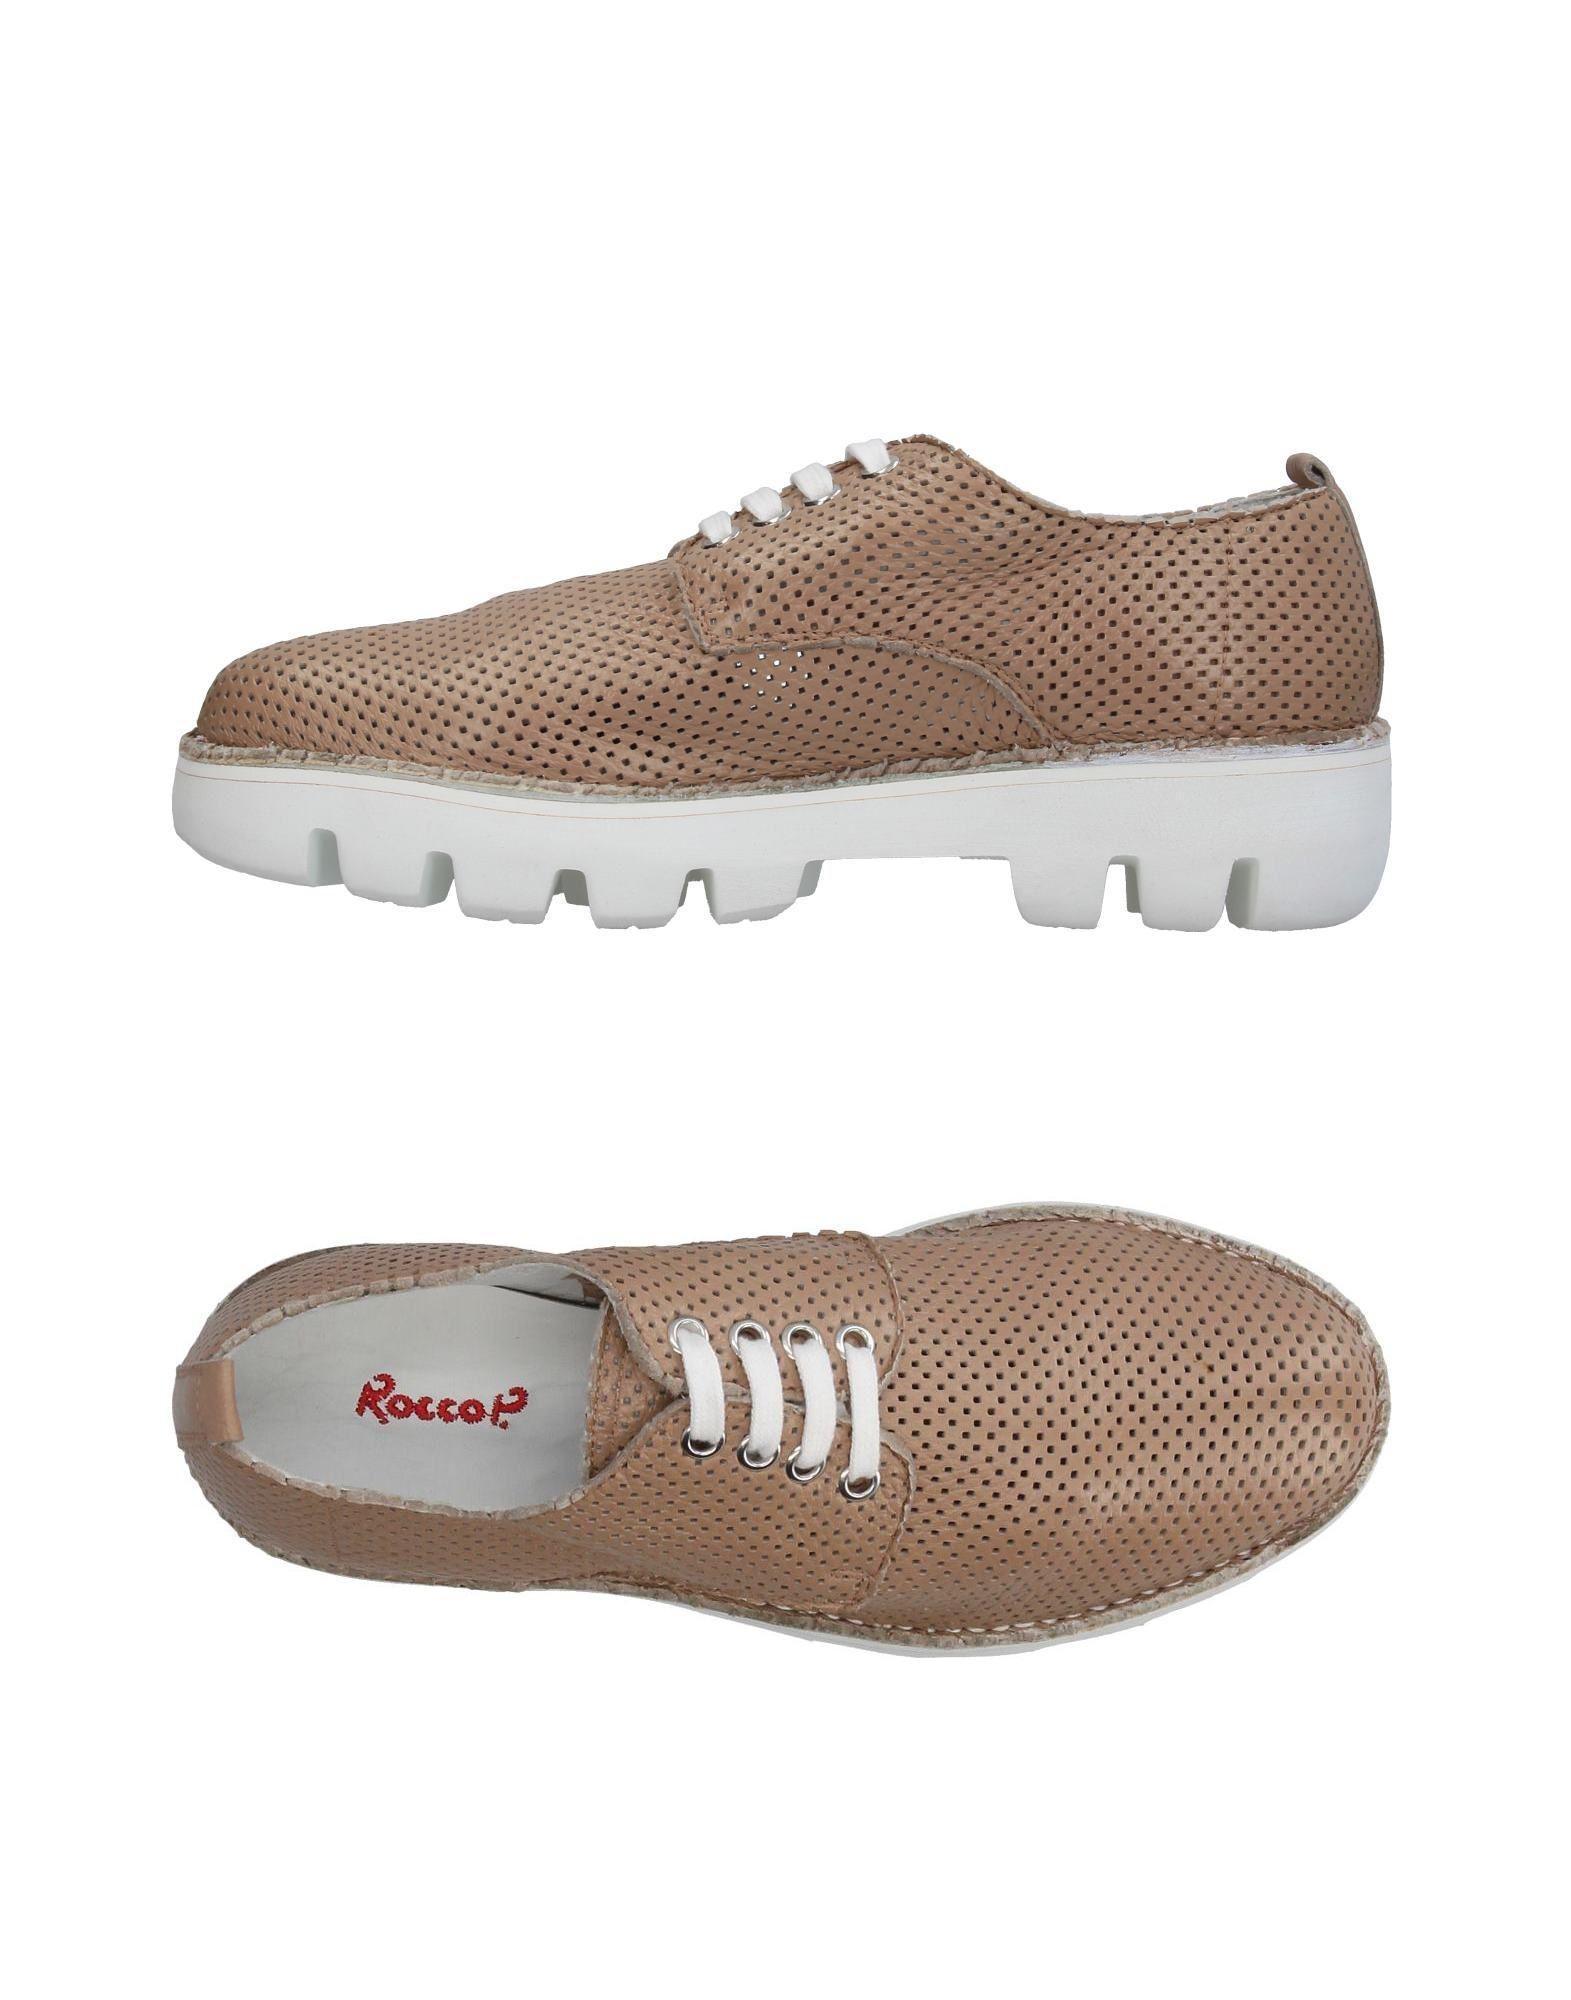 FOOTWEAR - Lace-up shoes Rocco P. JhIx36zw